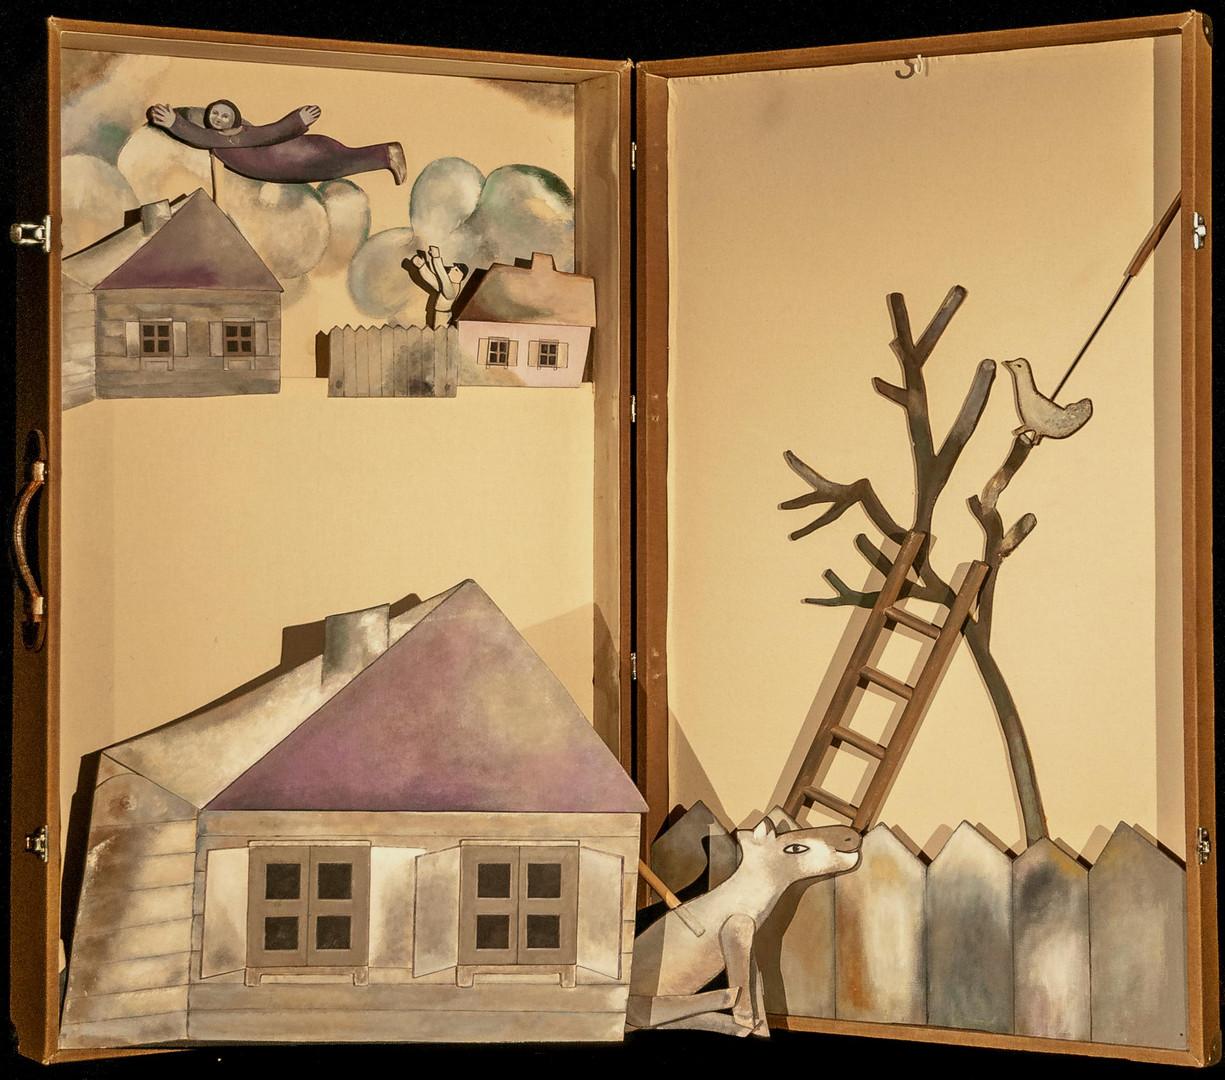 La valise de Chagall